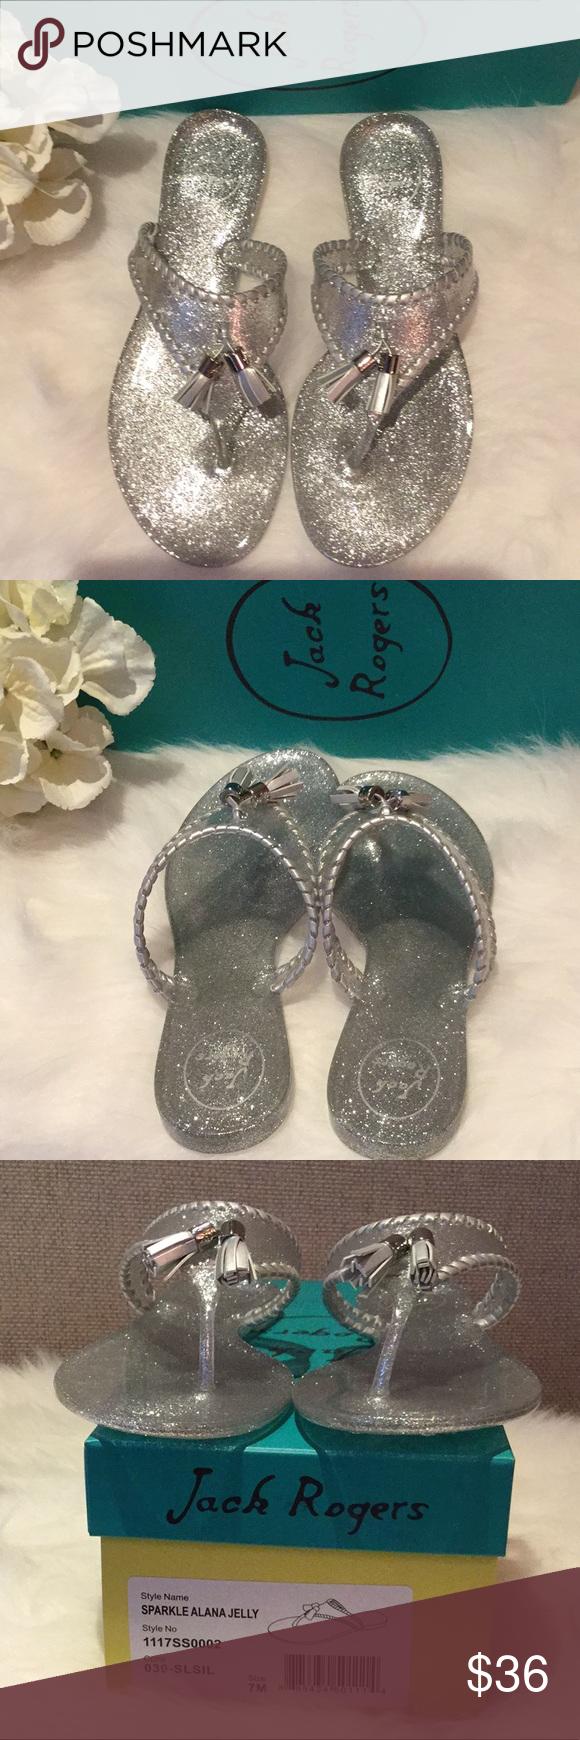 d97987098716 Jack Rogers Silver Sparkle Alana Jelly Sandals NWT Cute and sparkly silver jelly  sandals by Jack